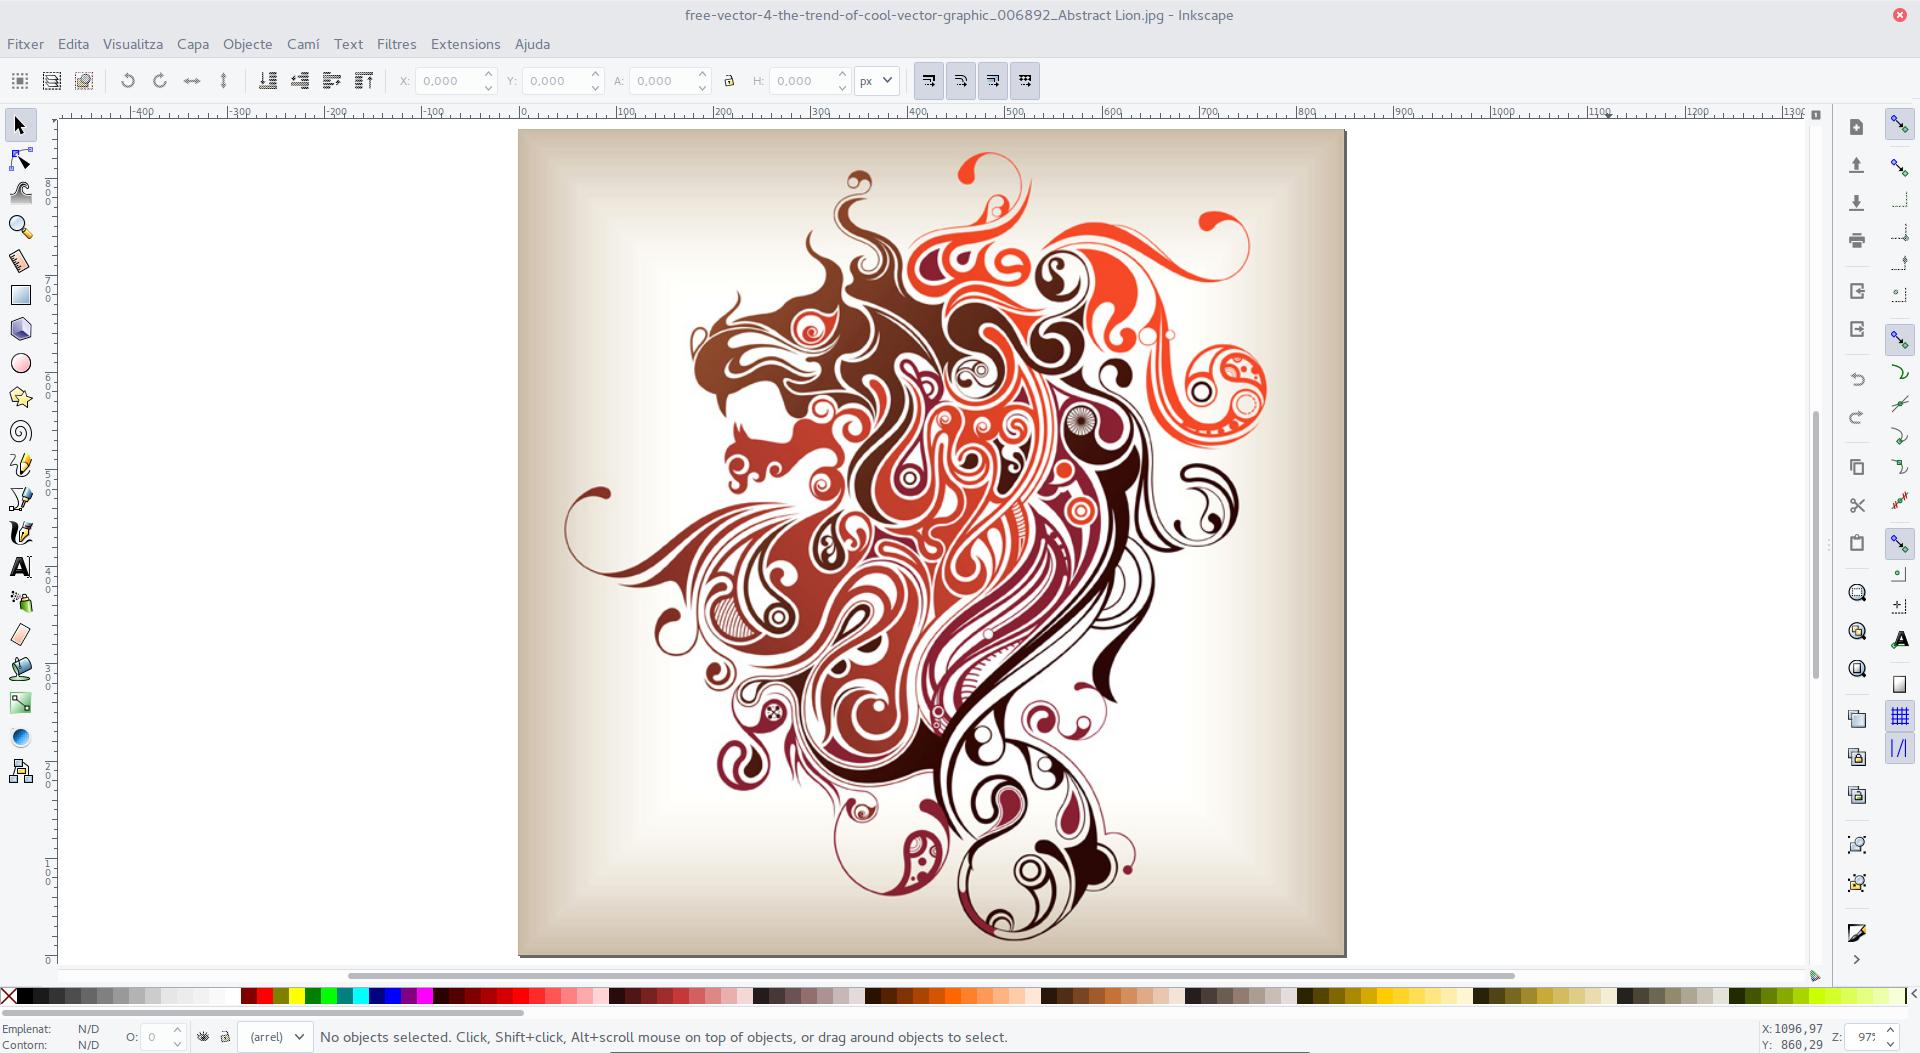 Imatge destacada 1 del Inkscape